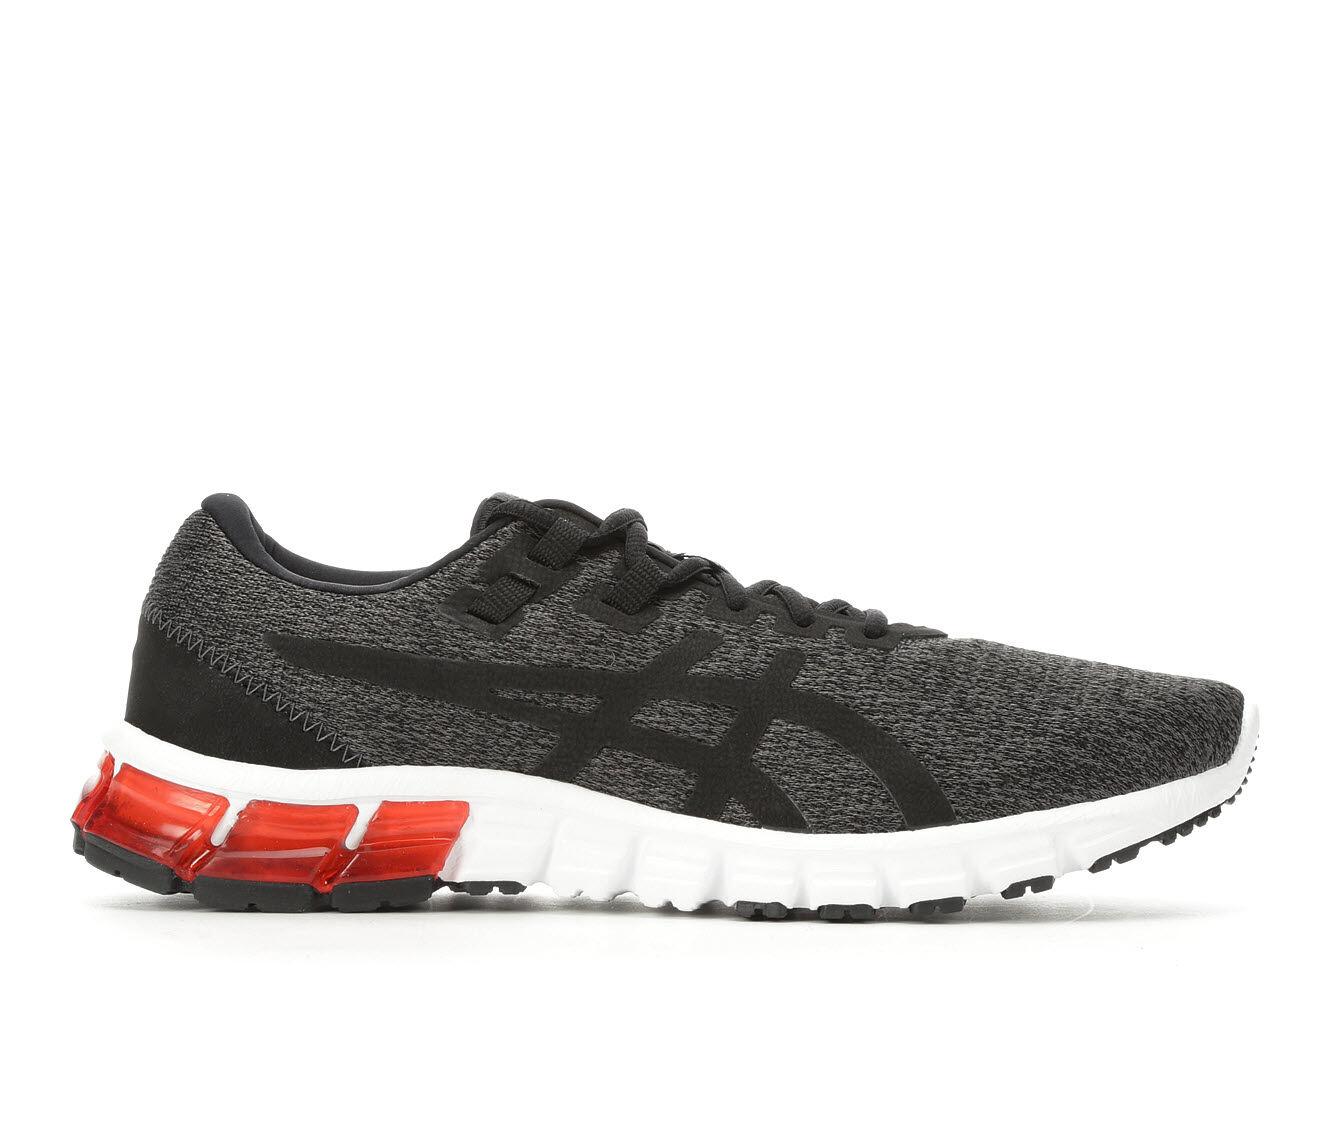 Men's ASICS Gel Quantum 90 Running Shoes Gry/Bk/Wht/Rd